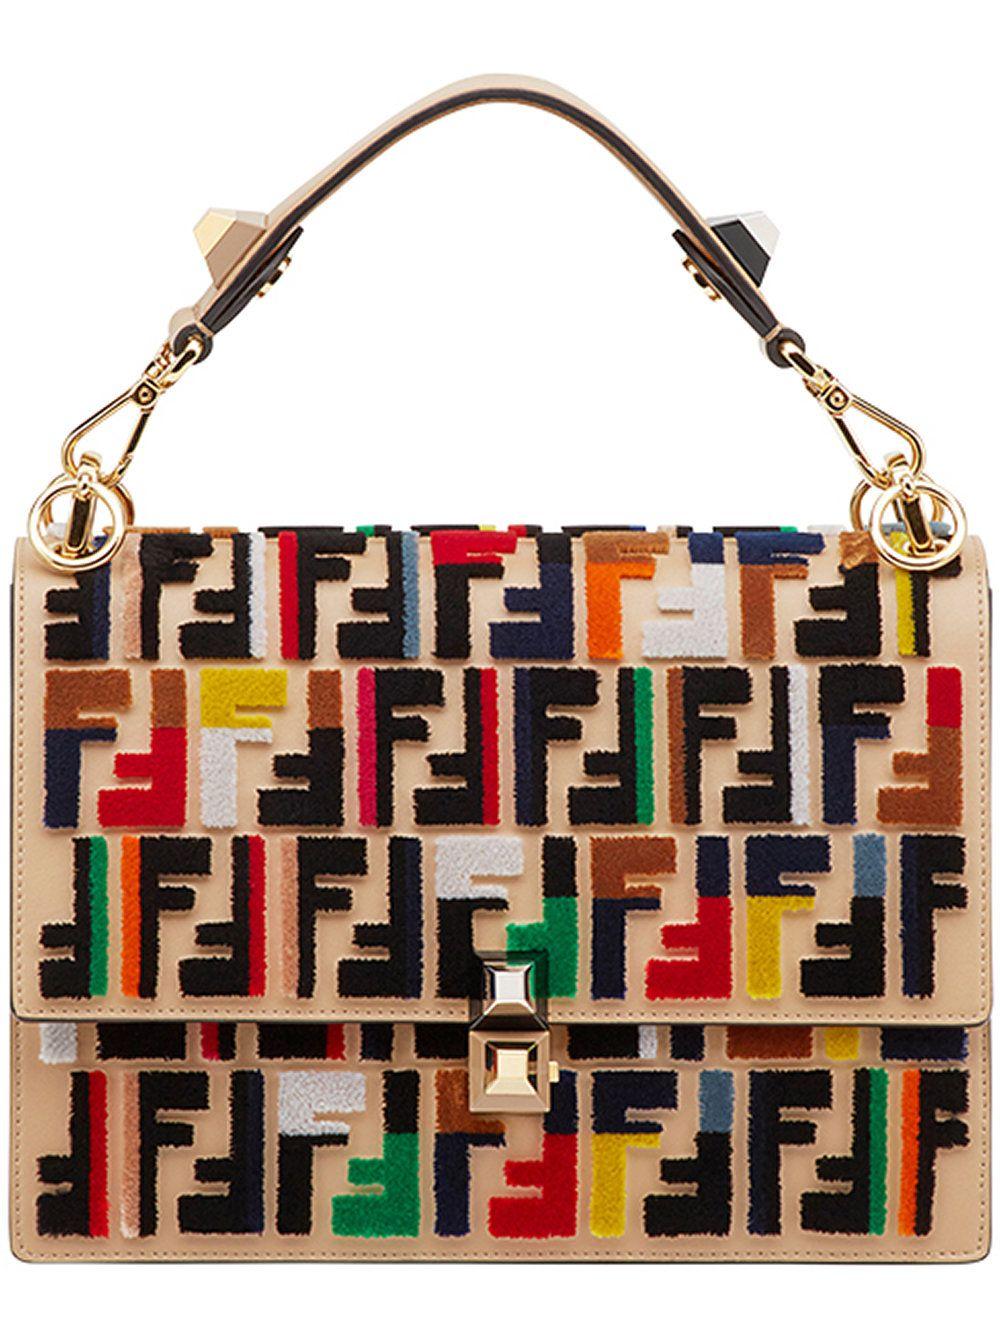 4e95b387634c FENDI ❤ - Sale! Up to 75% OFF! Shop at Stylizio for women s and men s designer  handbags